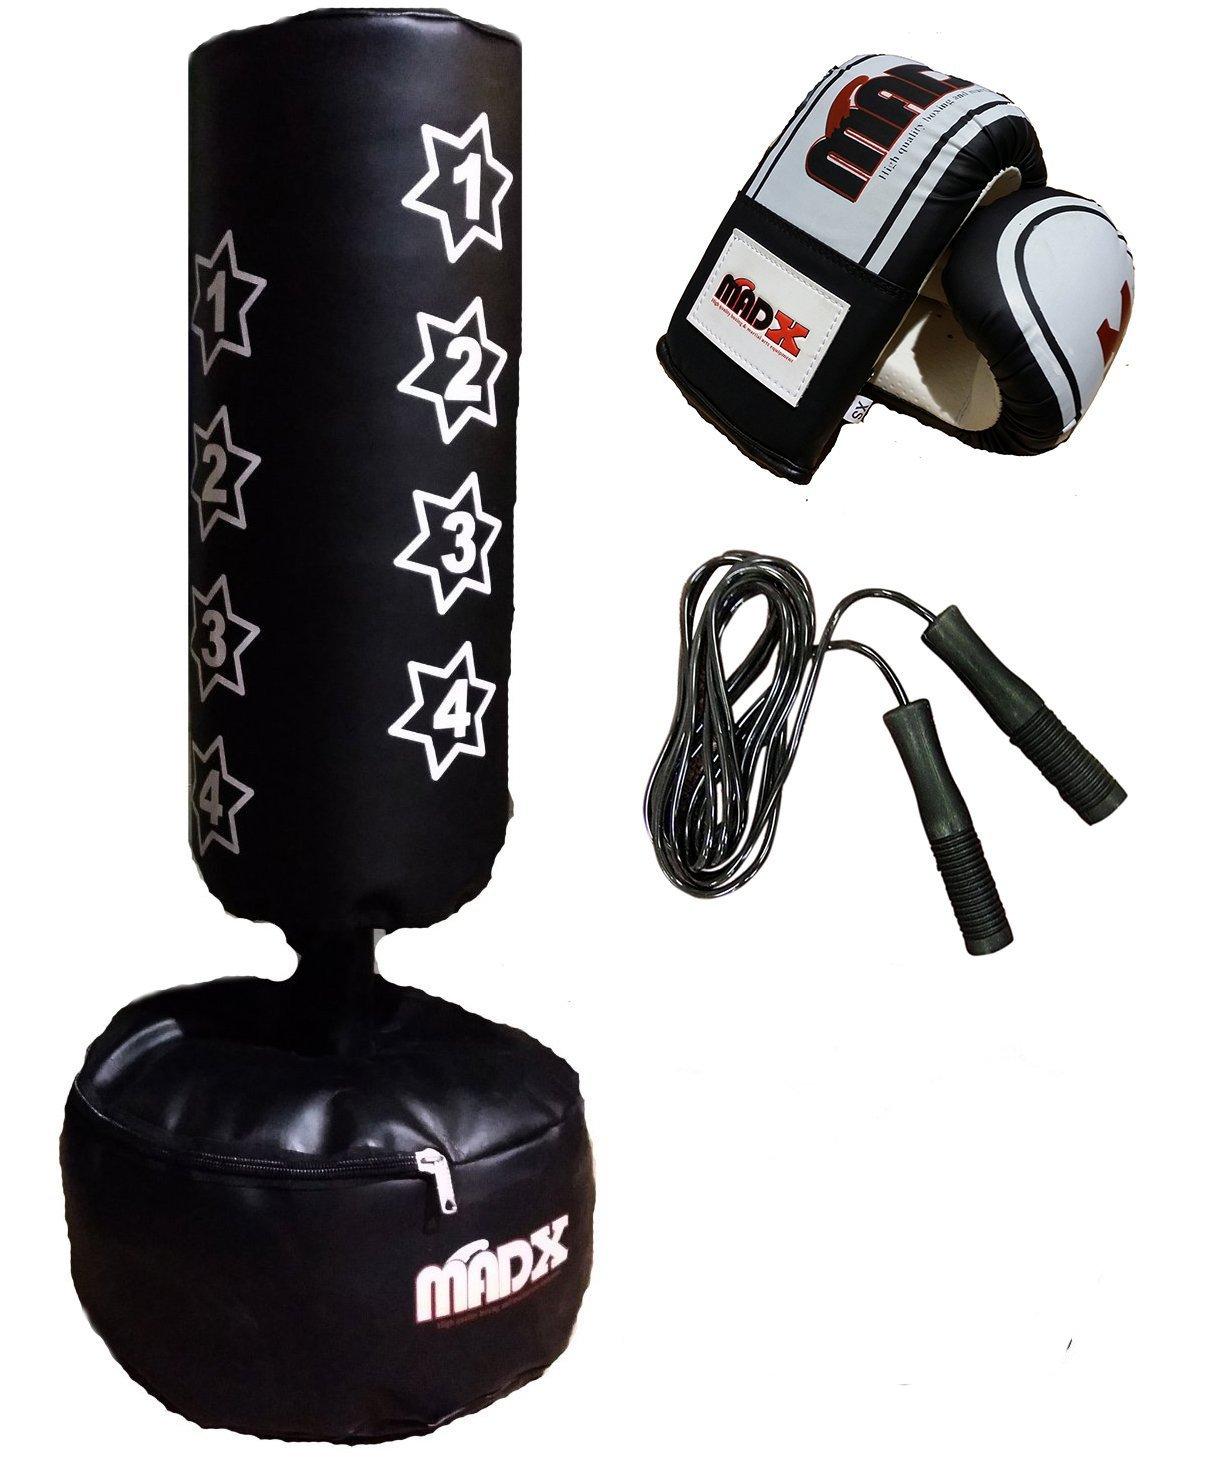 MADX Kids/Junior Boxing FREE STANDING Punch bag Set Freestanding Bag + Gloves